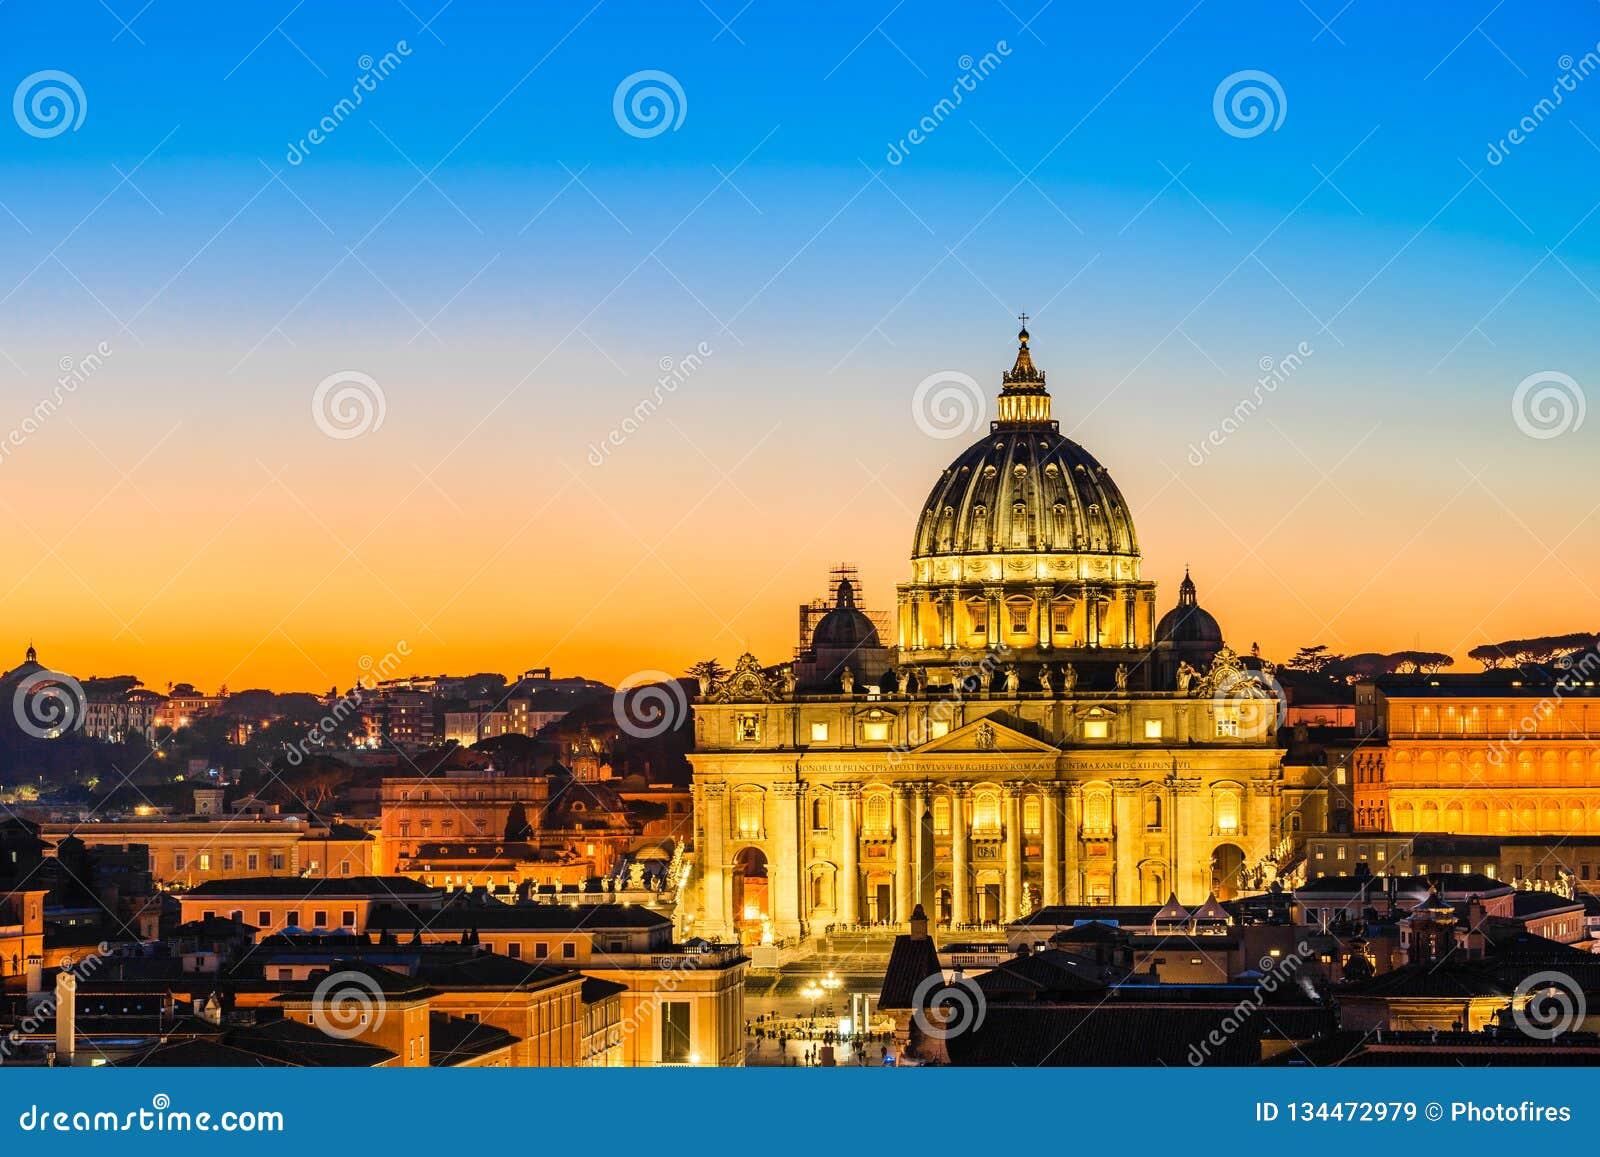 Взгляд ночи базилики St Peter в государстве Ватикан, Риме, Италии